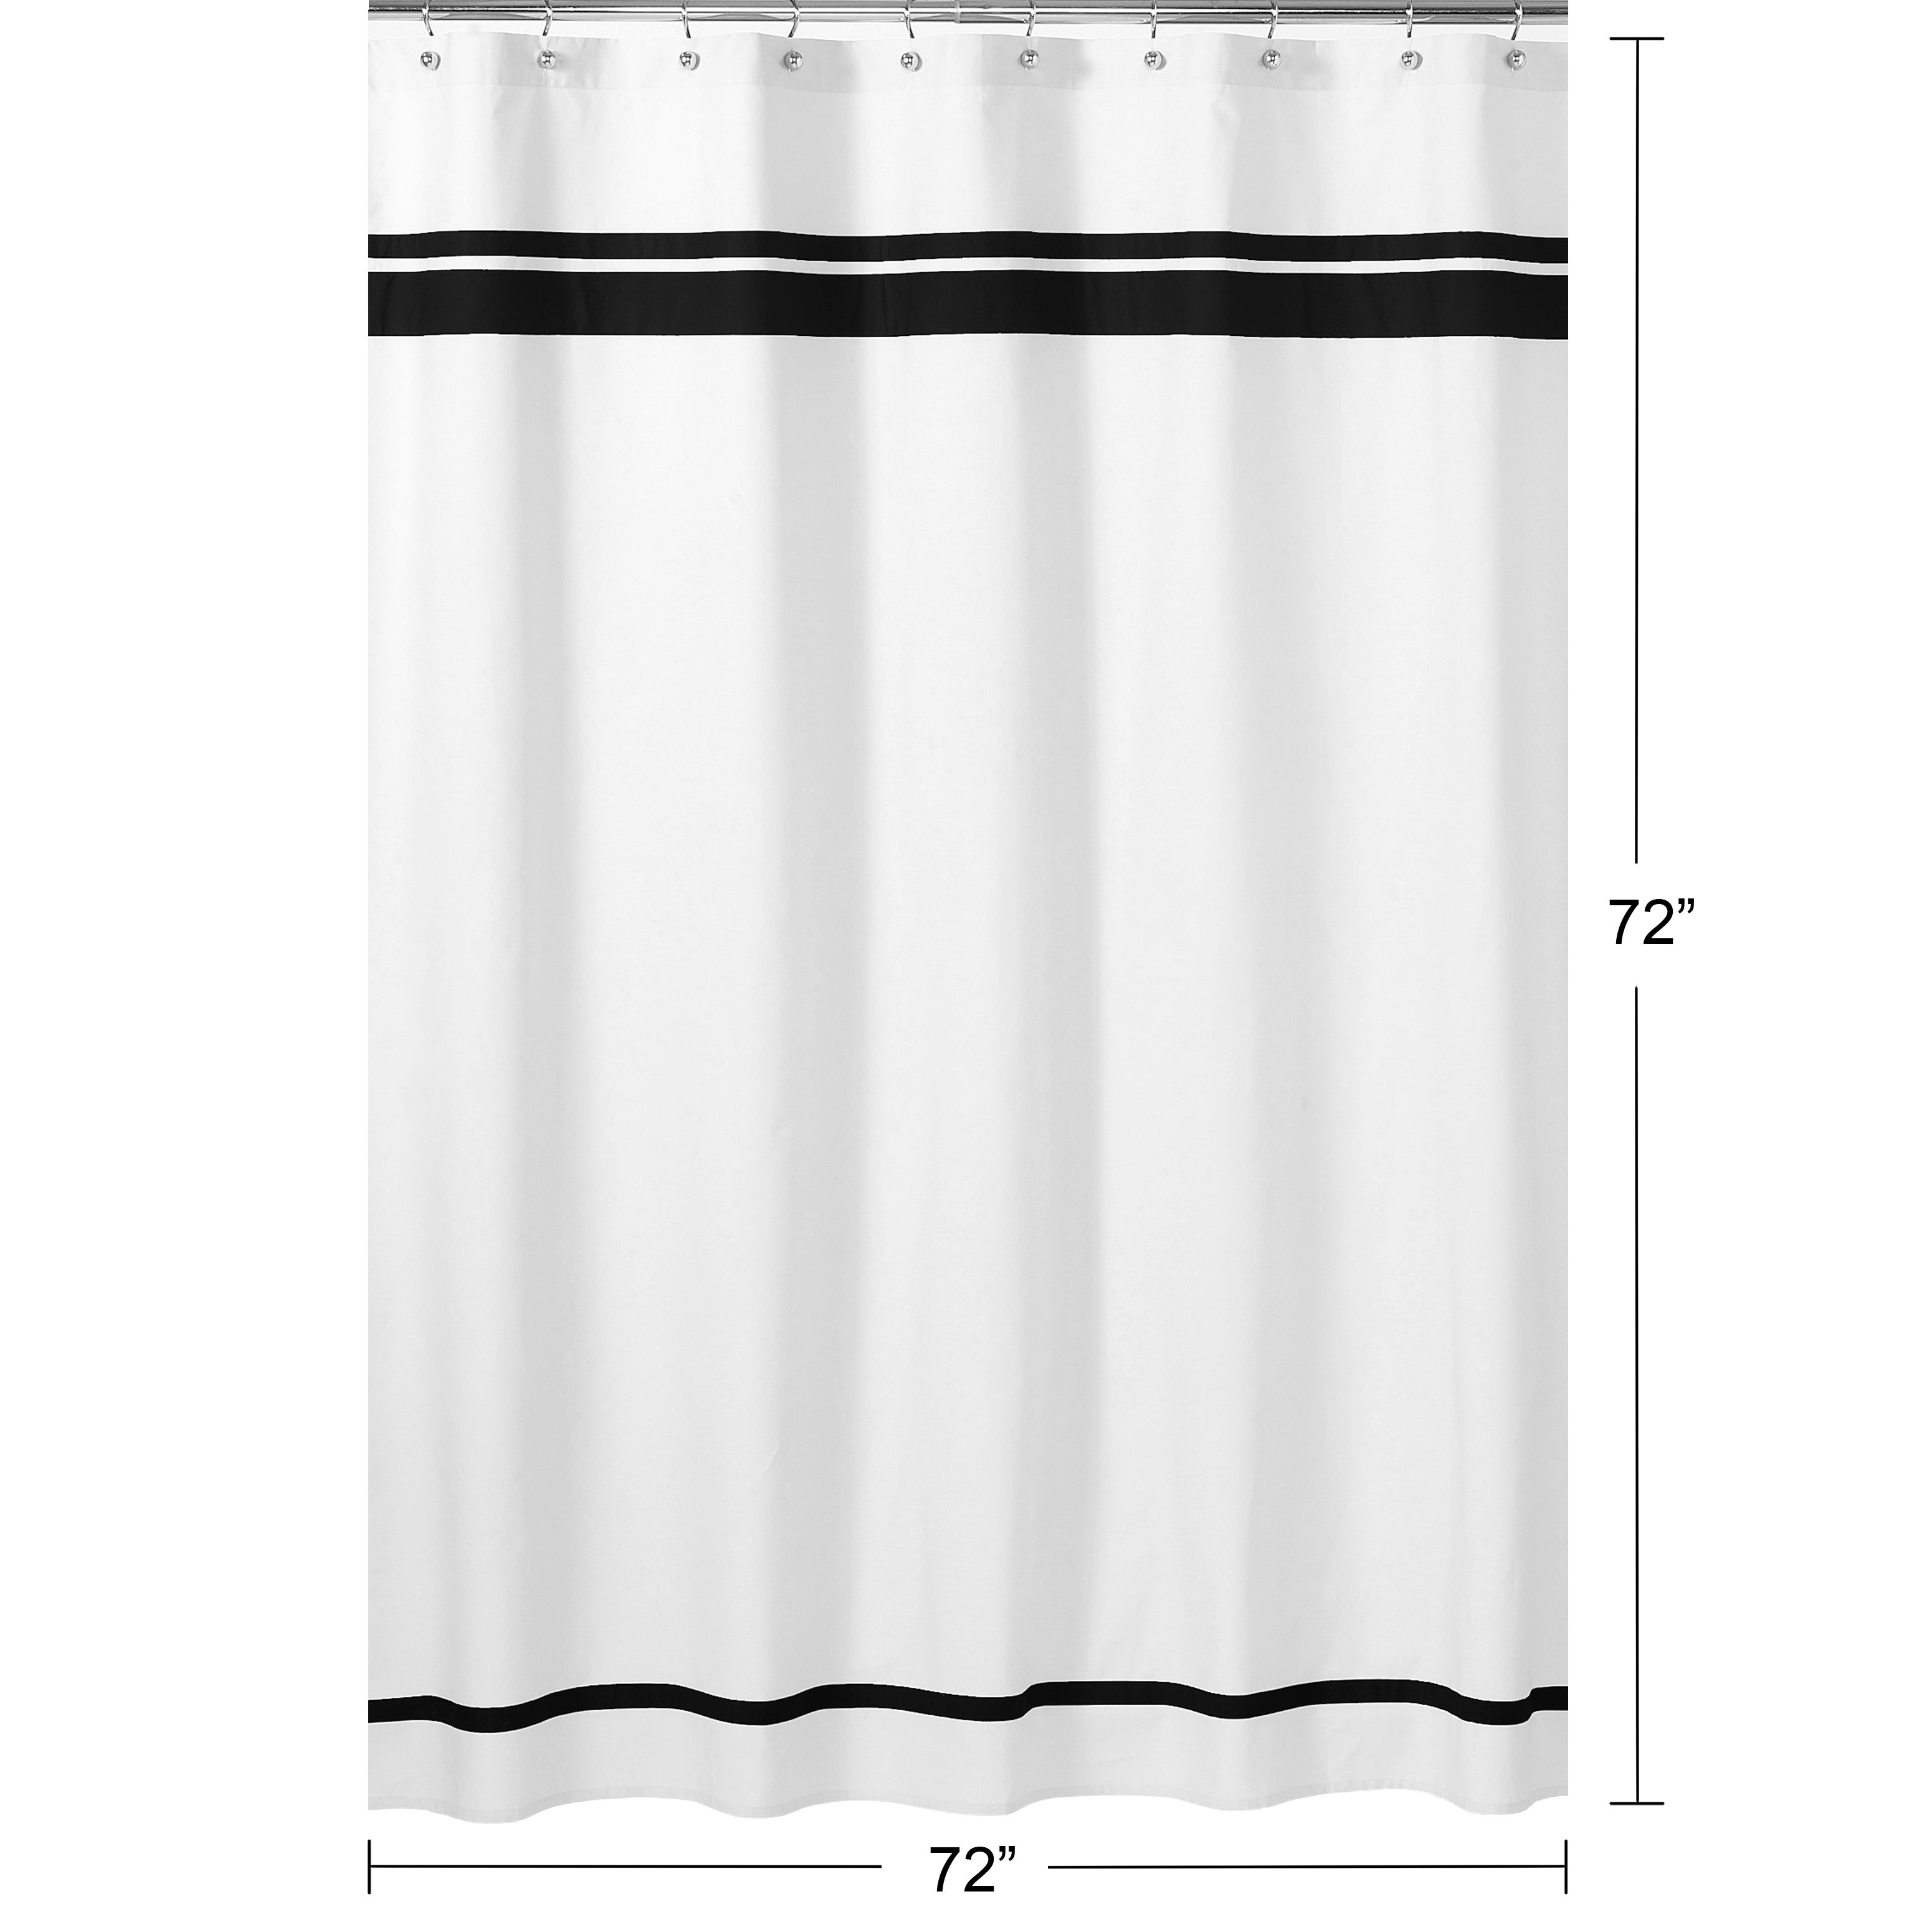 Sweet Jojo Designs White And Black Hotel Shower Curtain Overstock 7605147